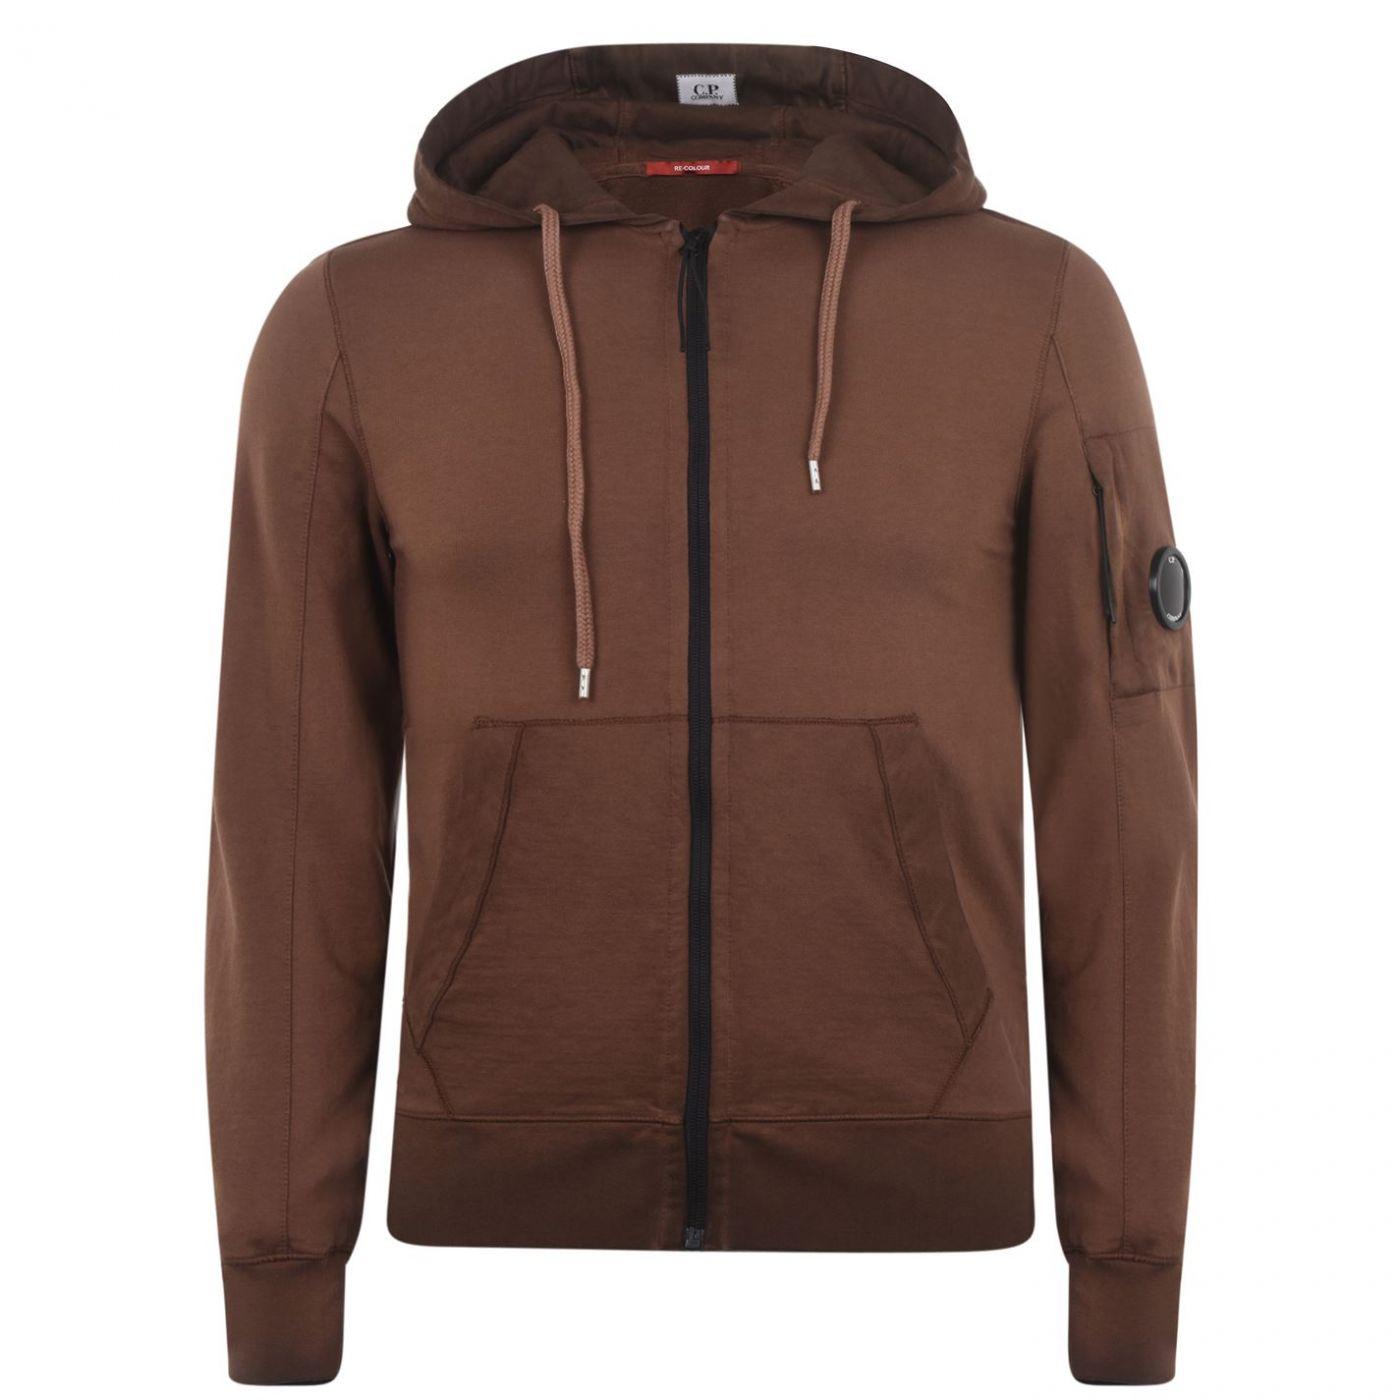 CP COMPANY 7a0 Hooded Sweatshirt